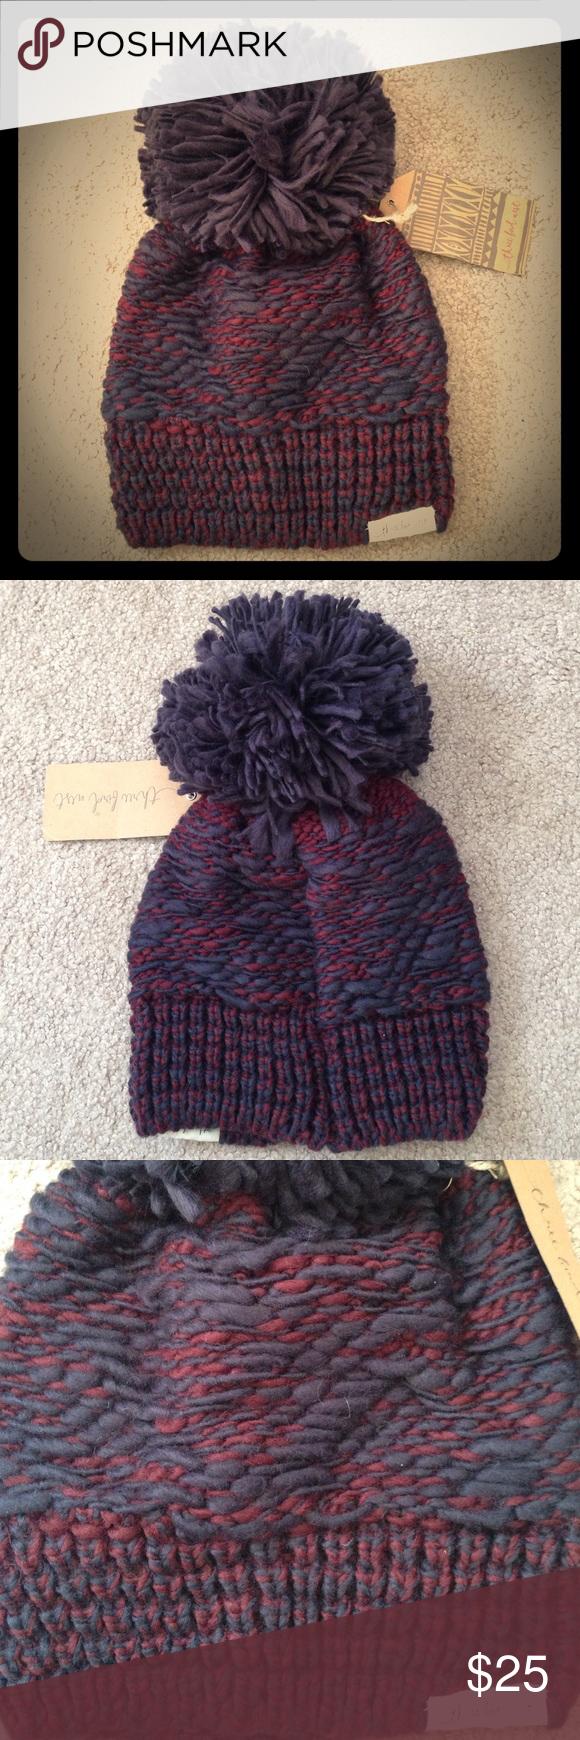 81805a21e30 Marled color combo knit pom pom beanie Brand new from Three Bird Nest.  Adorable beanie